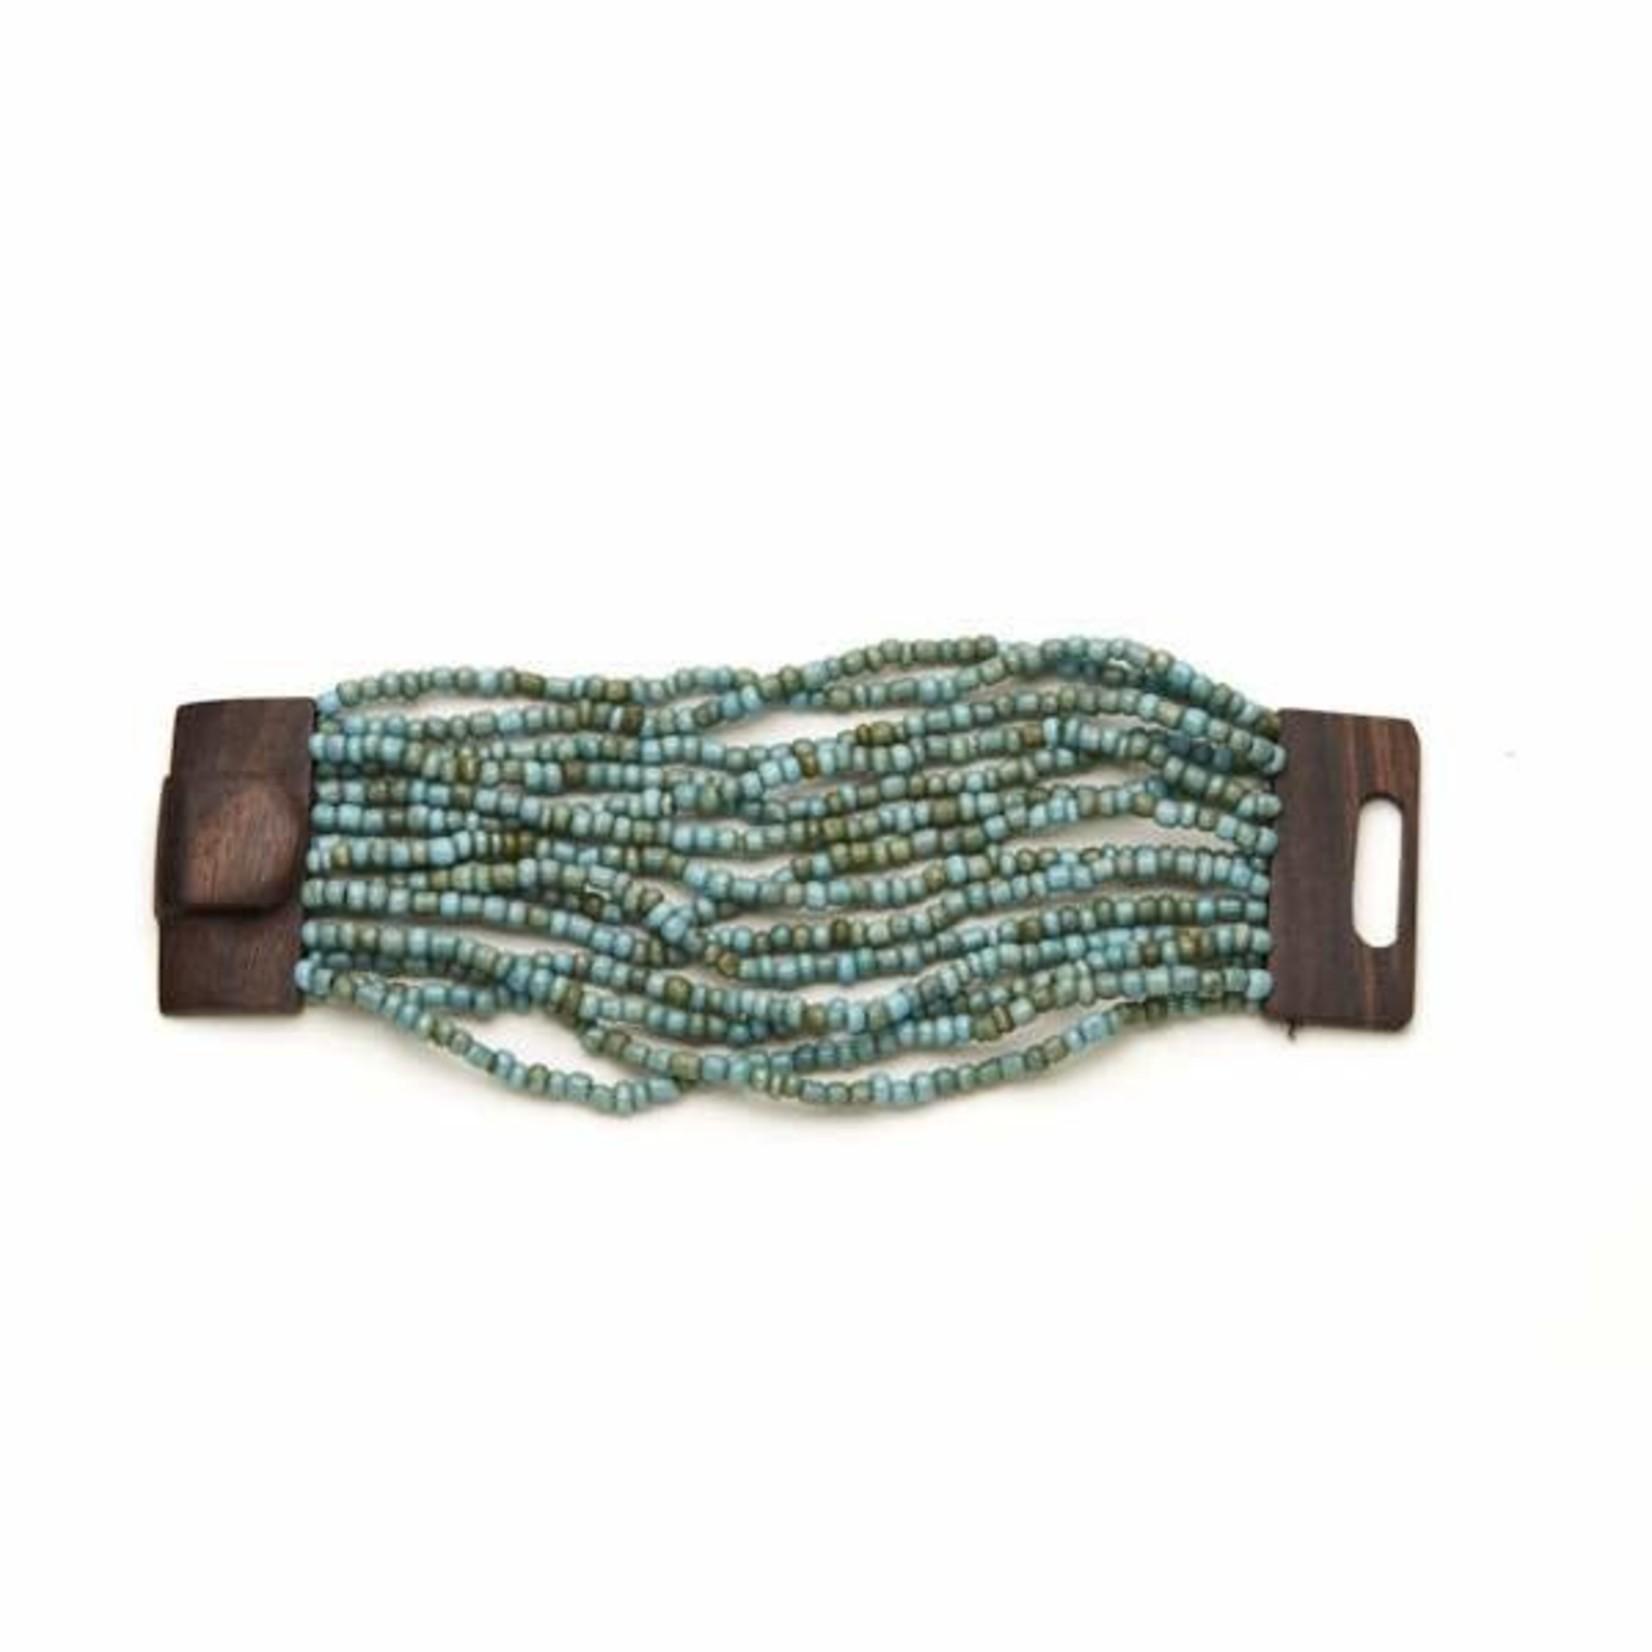 Suzie Blue Canada Multi-strand Bracelet w/ Wooden Clasp in Turquoise